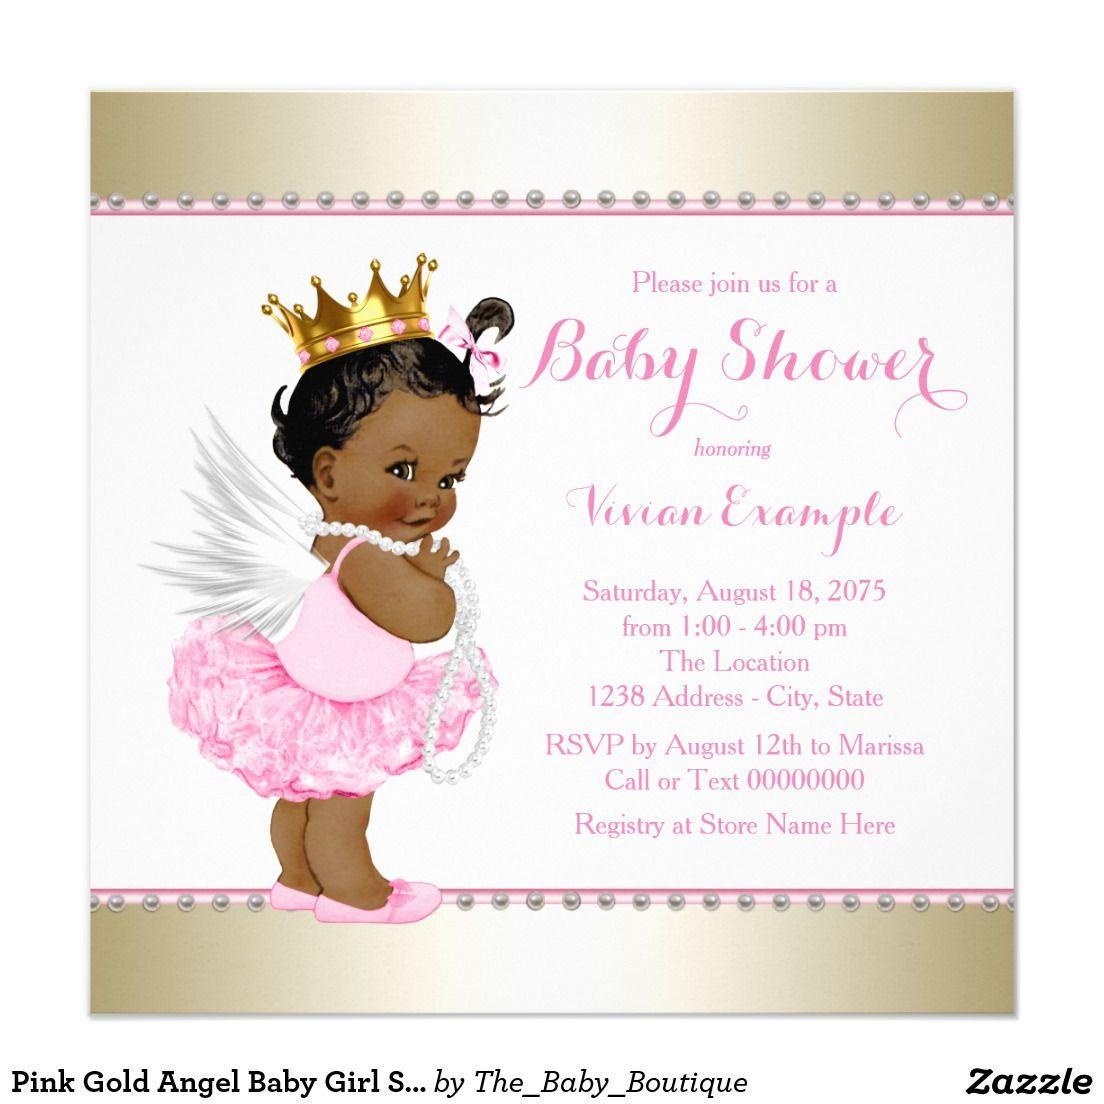 Pink Gold Angel Baby Girl Shower Invitation | Pinterest | Baby girl ...